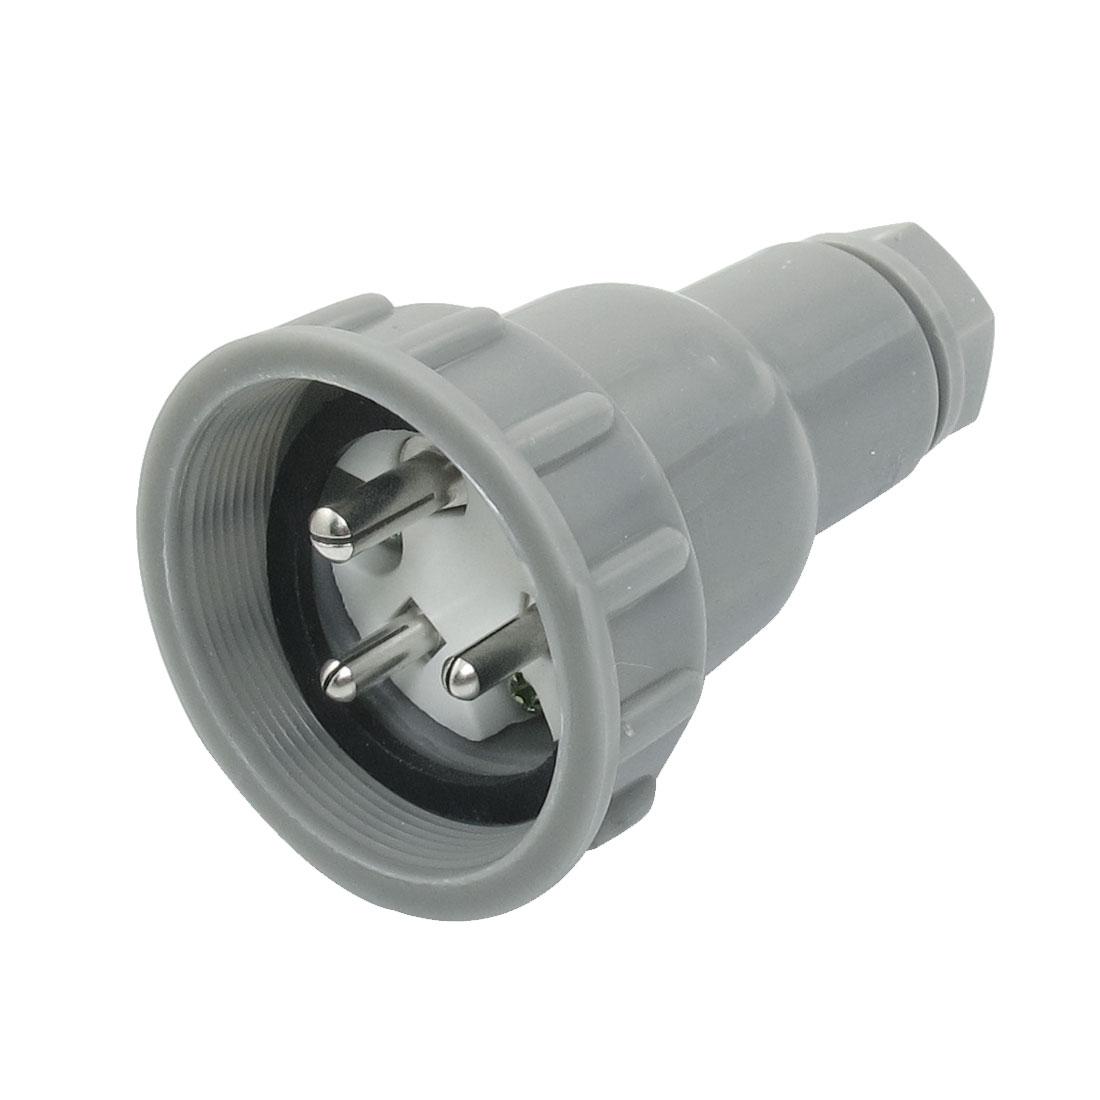 CTF3-1 Outdoor Water Resistant Marine Connector Gray 3P 500VAC 10A